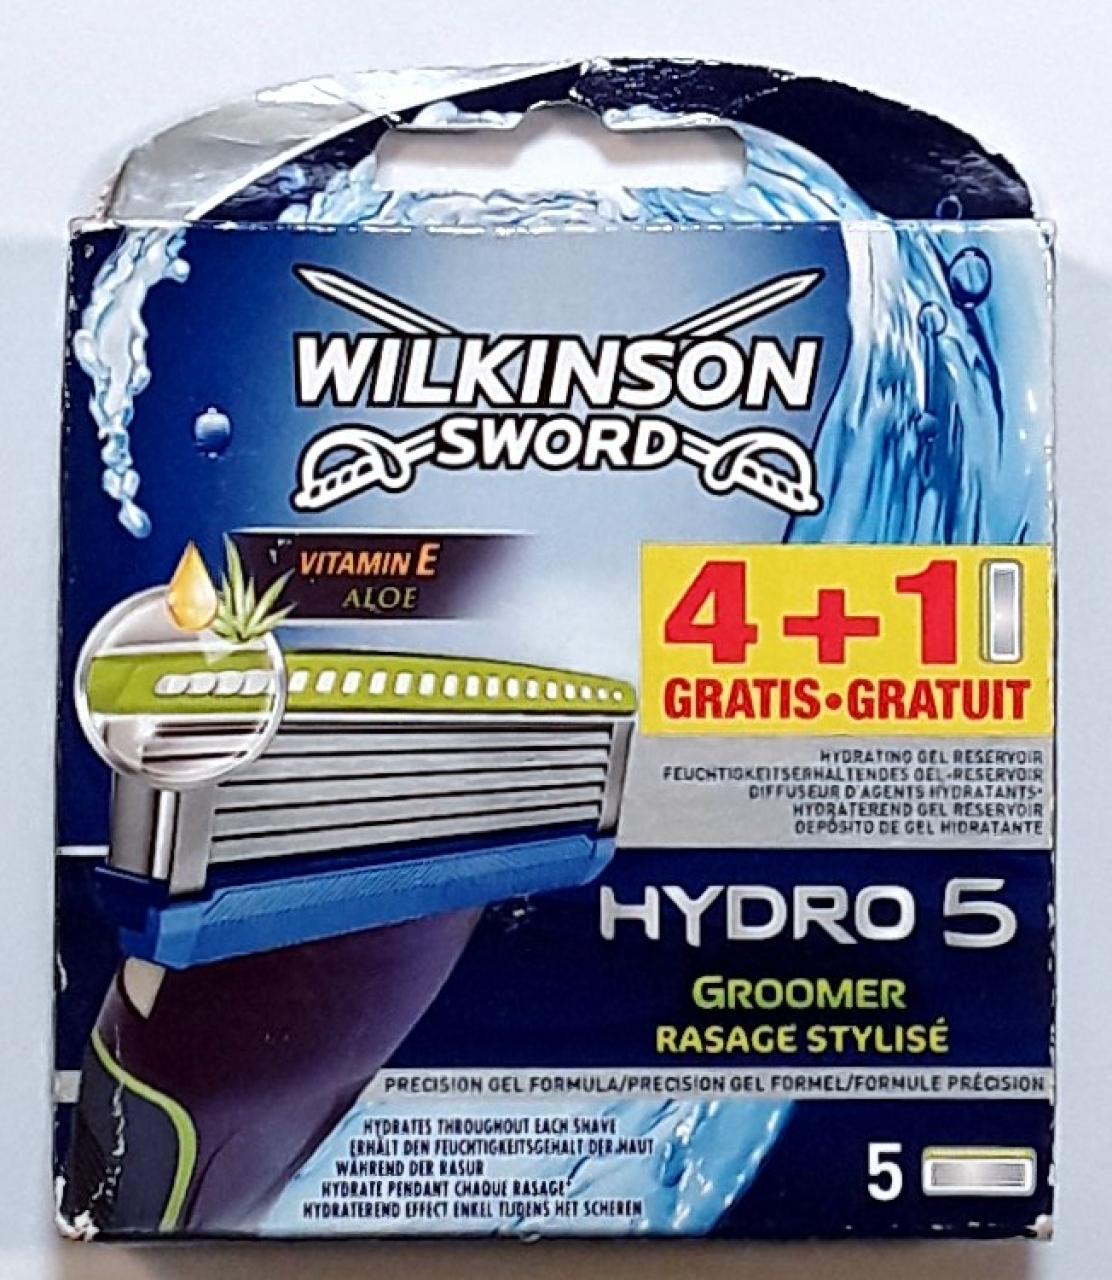 Schick / Wilkinson Sword Hydro5 сменные кассеты (5 штук)